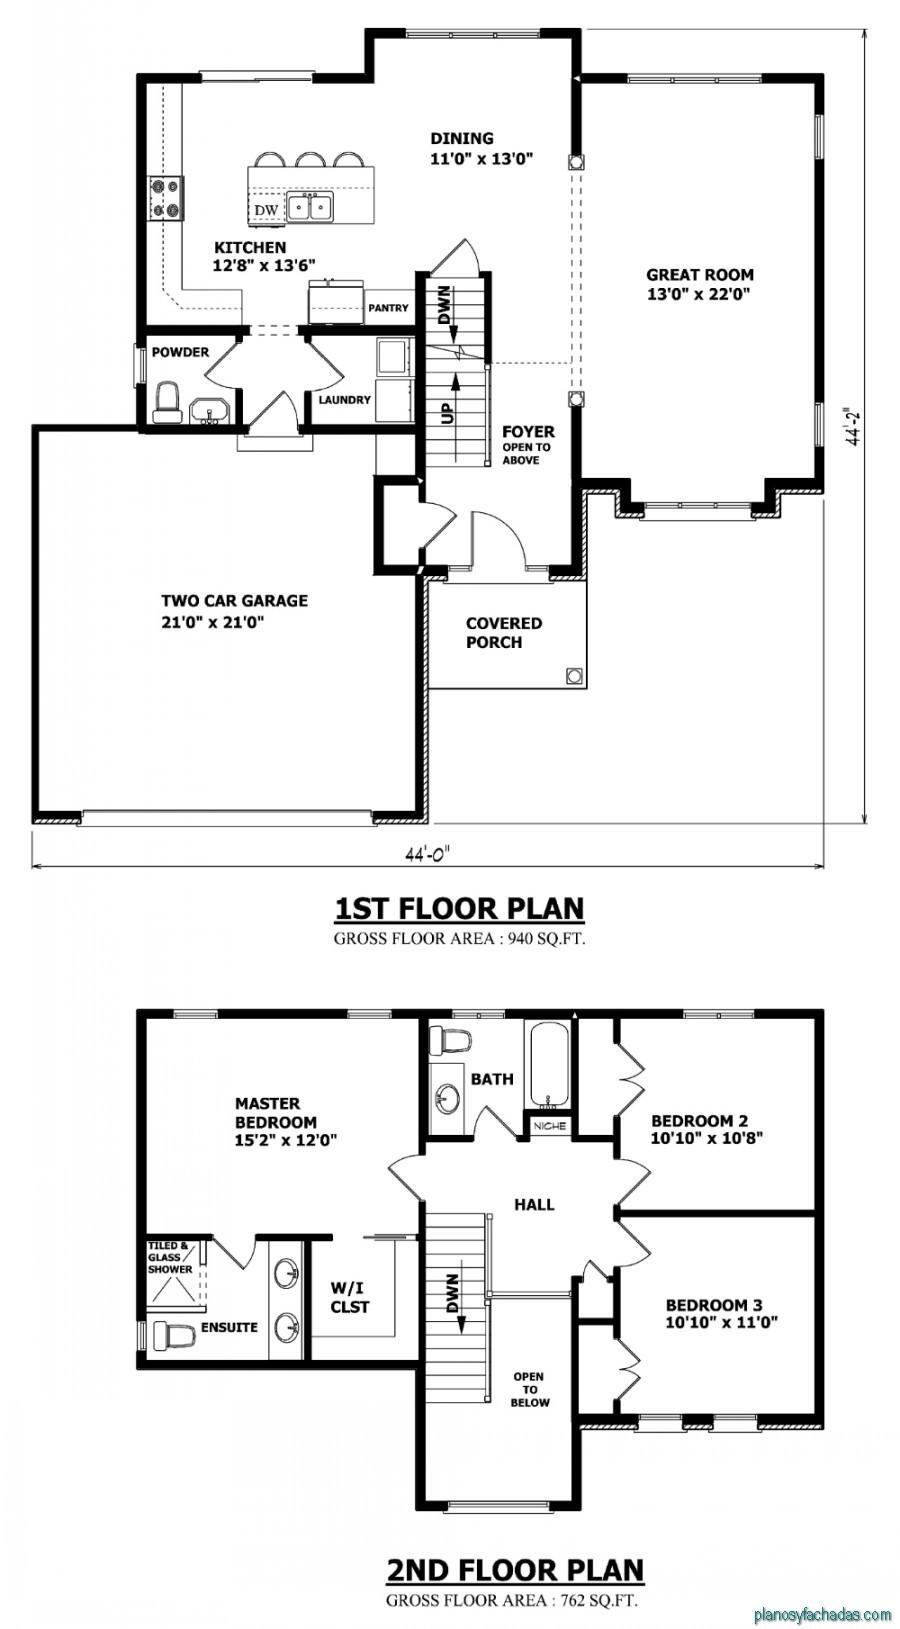 15 planos de casas peque as de dos pisos planos y for Planos de casas de dos pisos